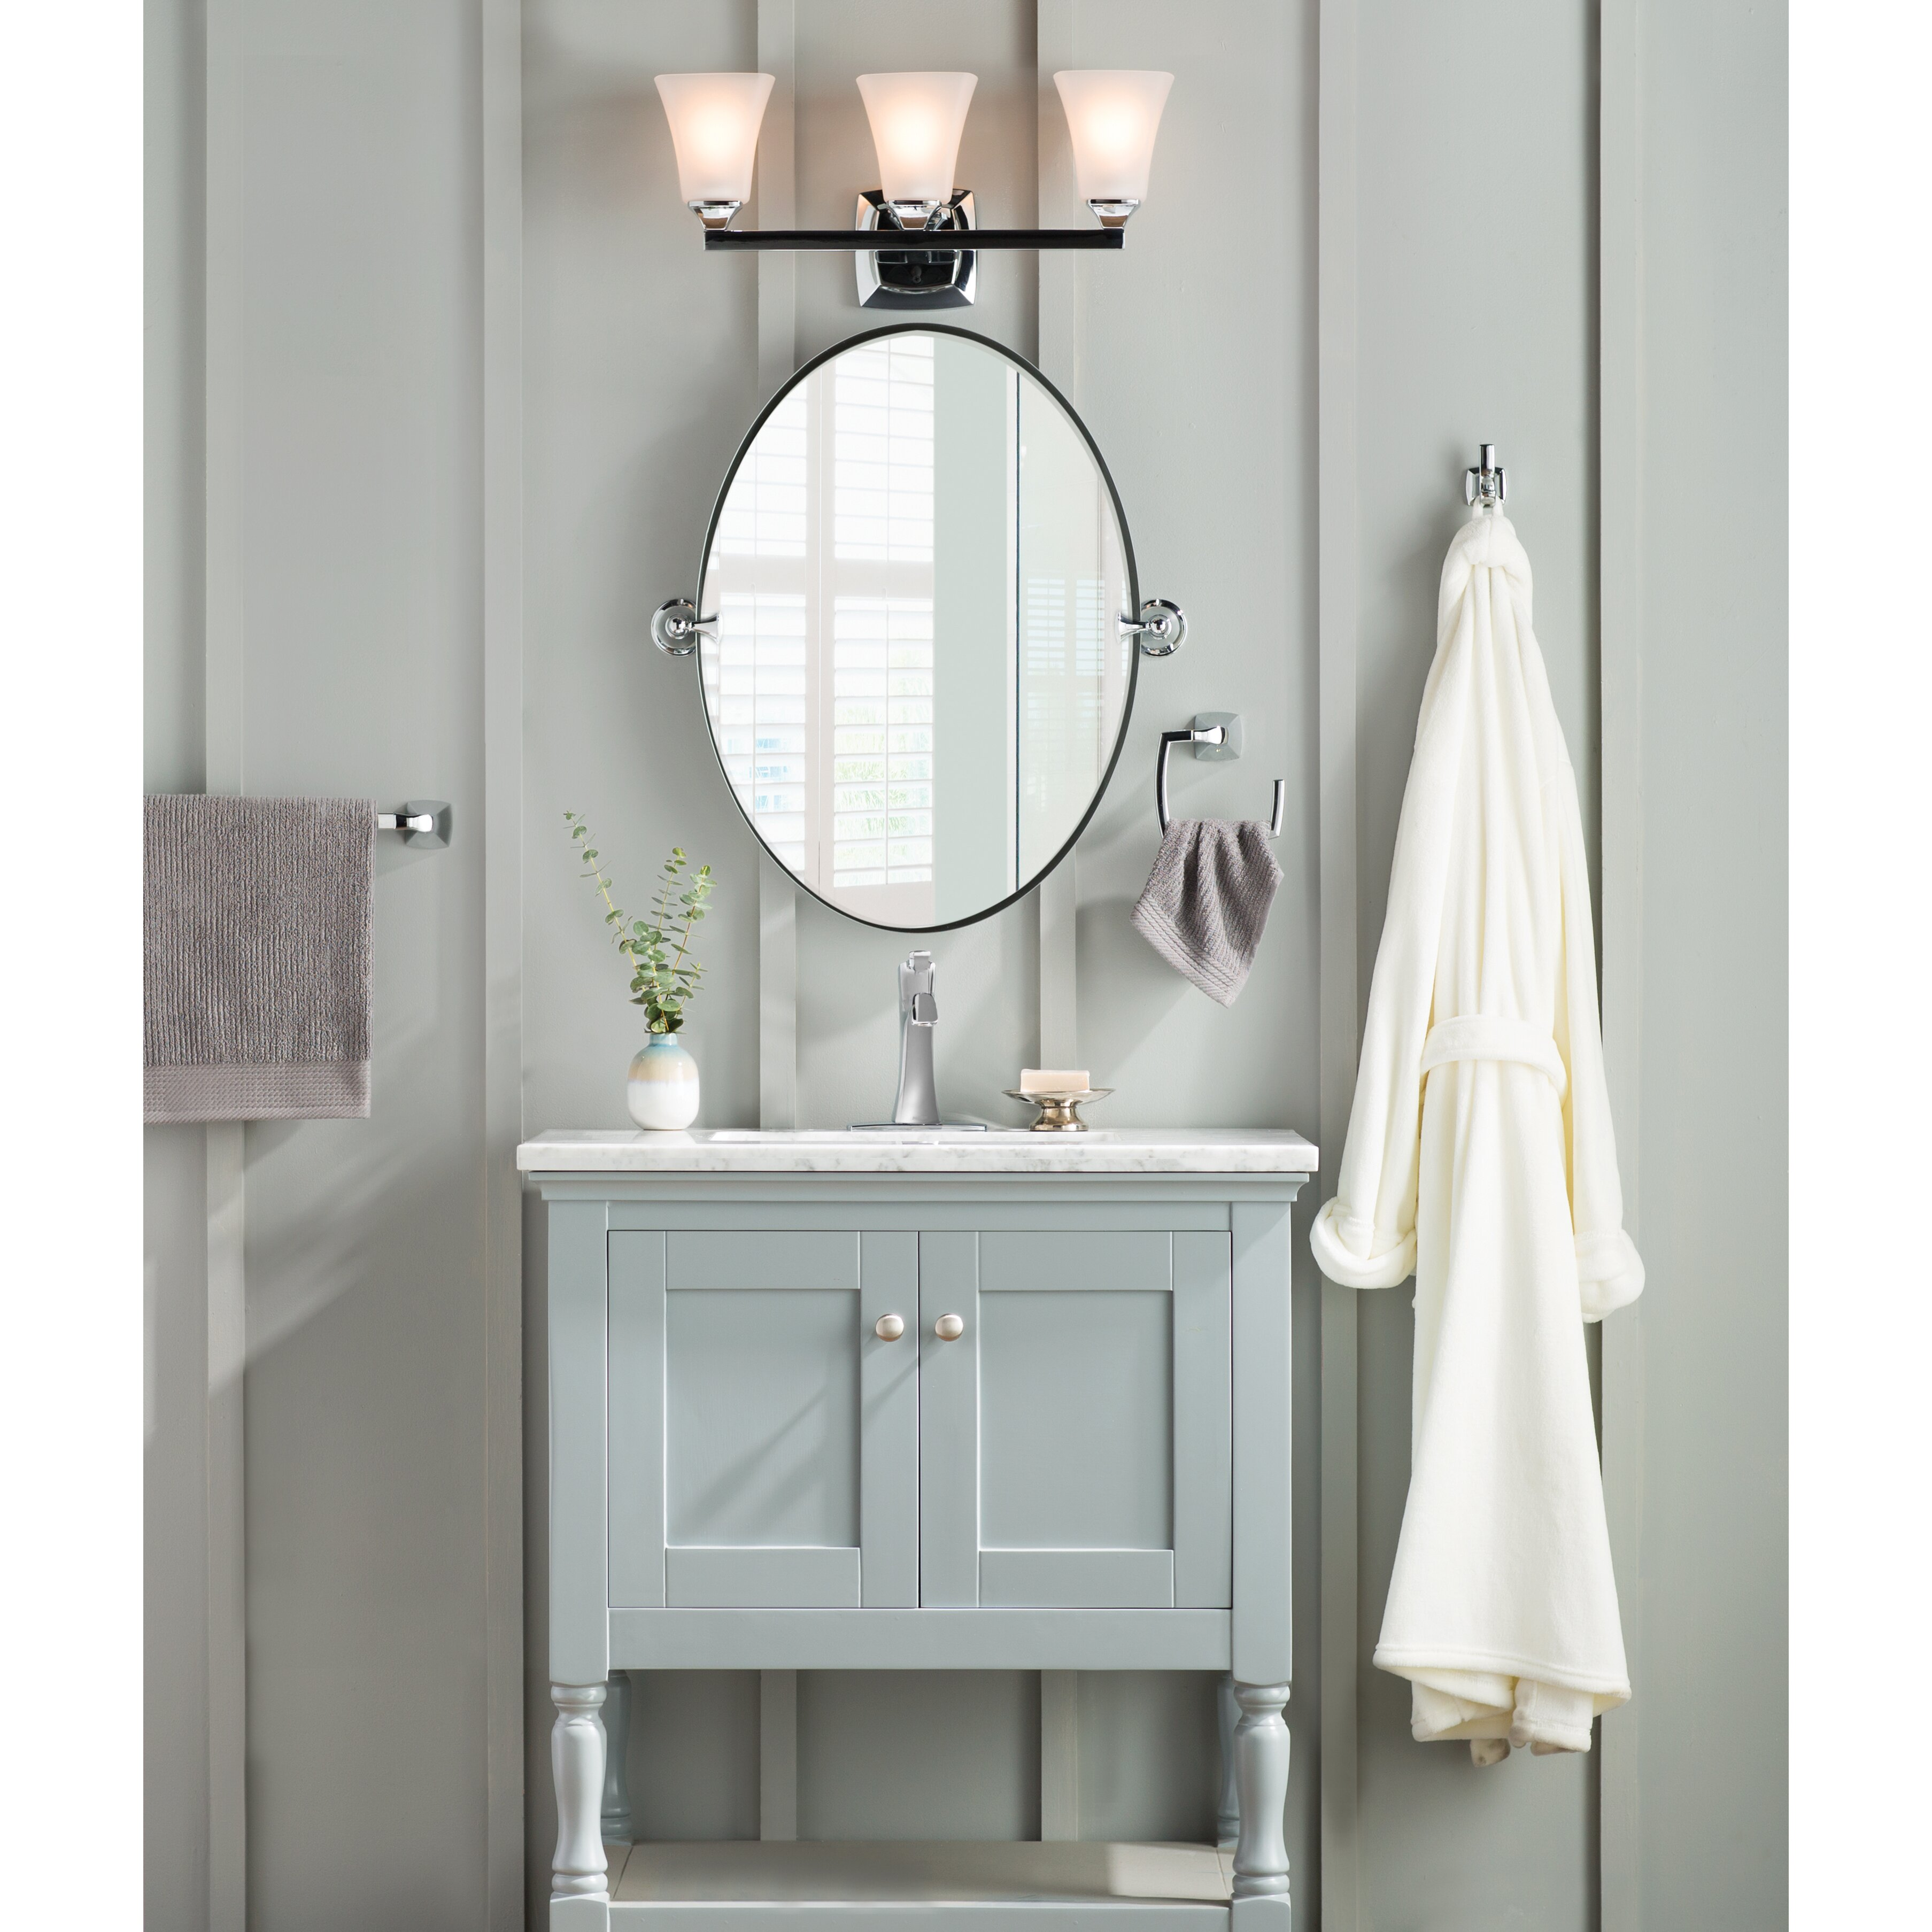 Bathroom Wall Mirrors line India Plastic Frame Wall Mirror